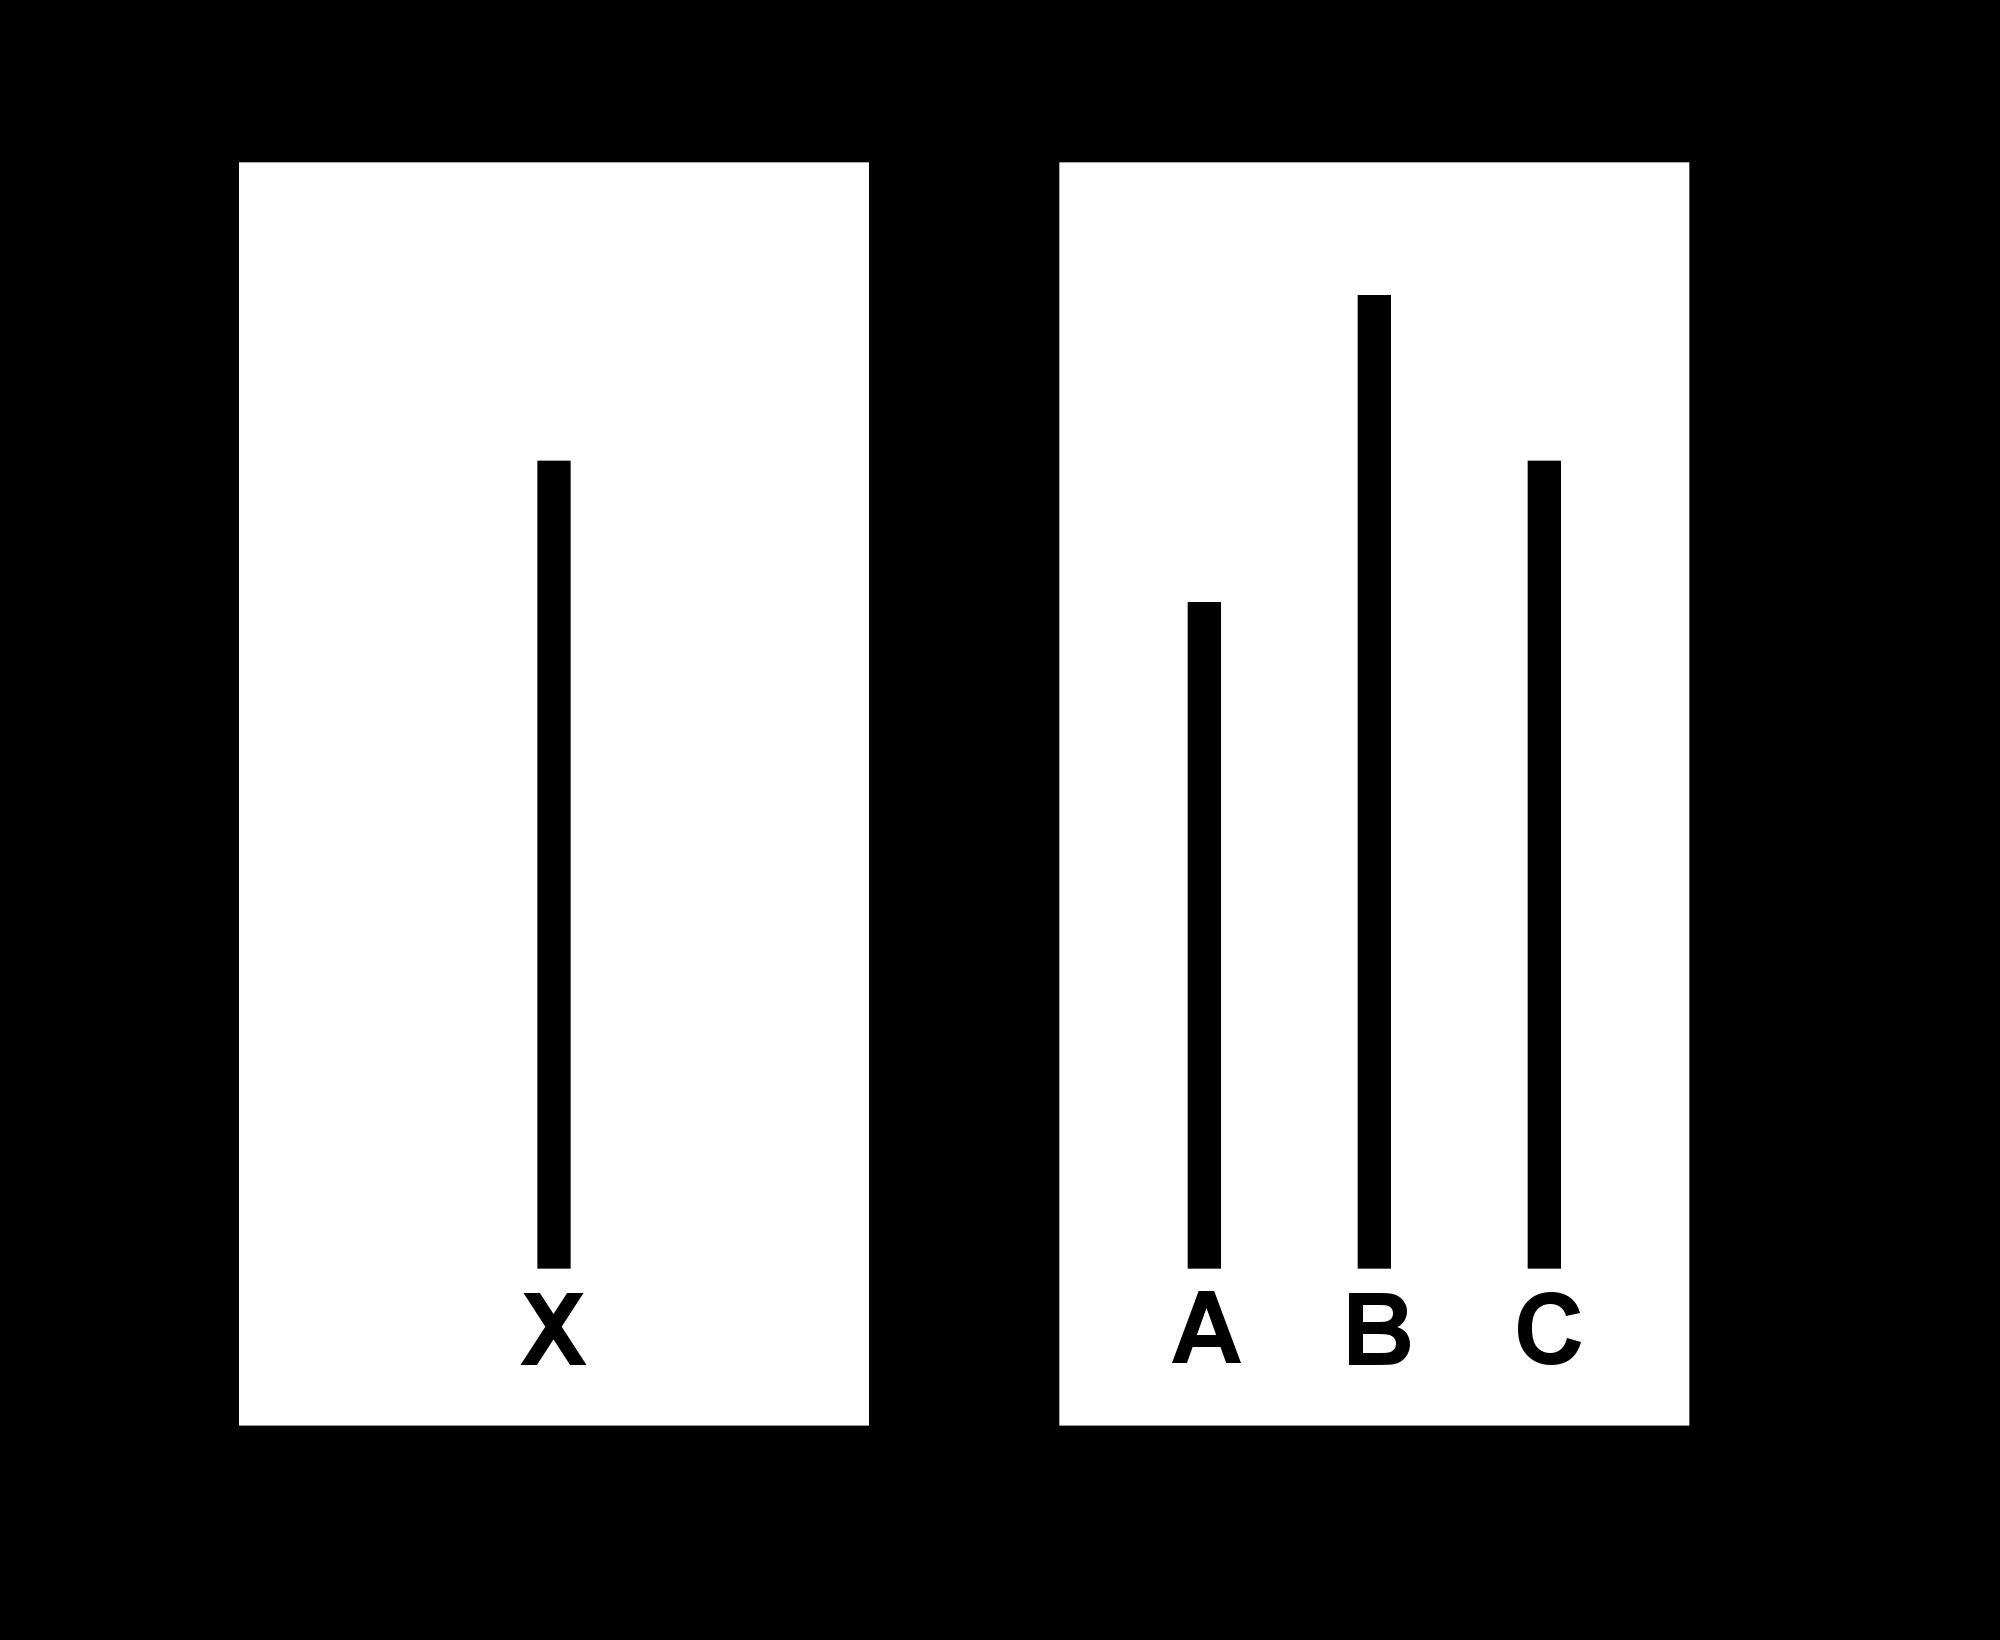 Eksperyment Ascha - Badanie nad konformizmem